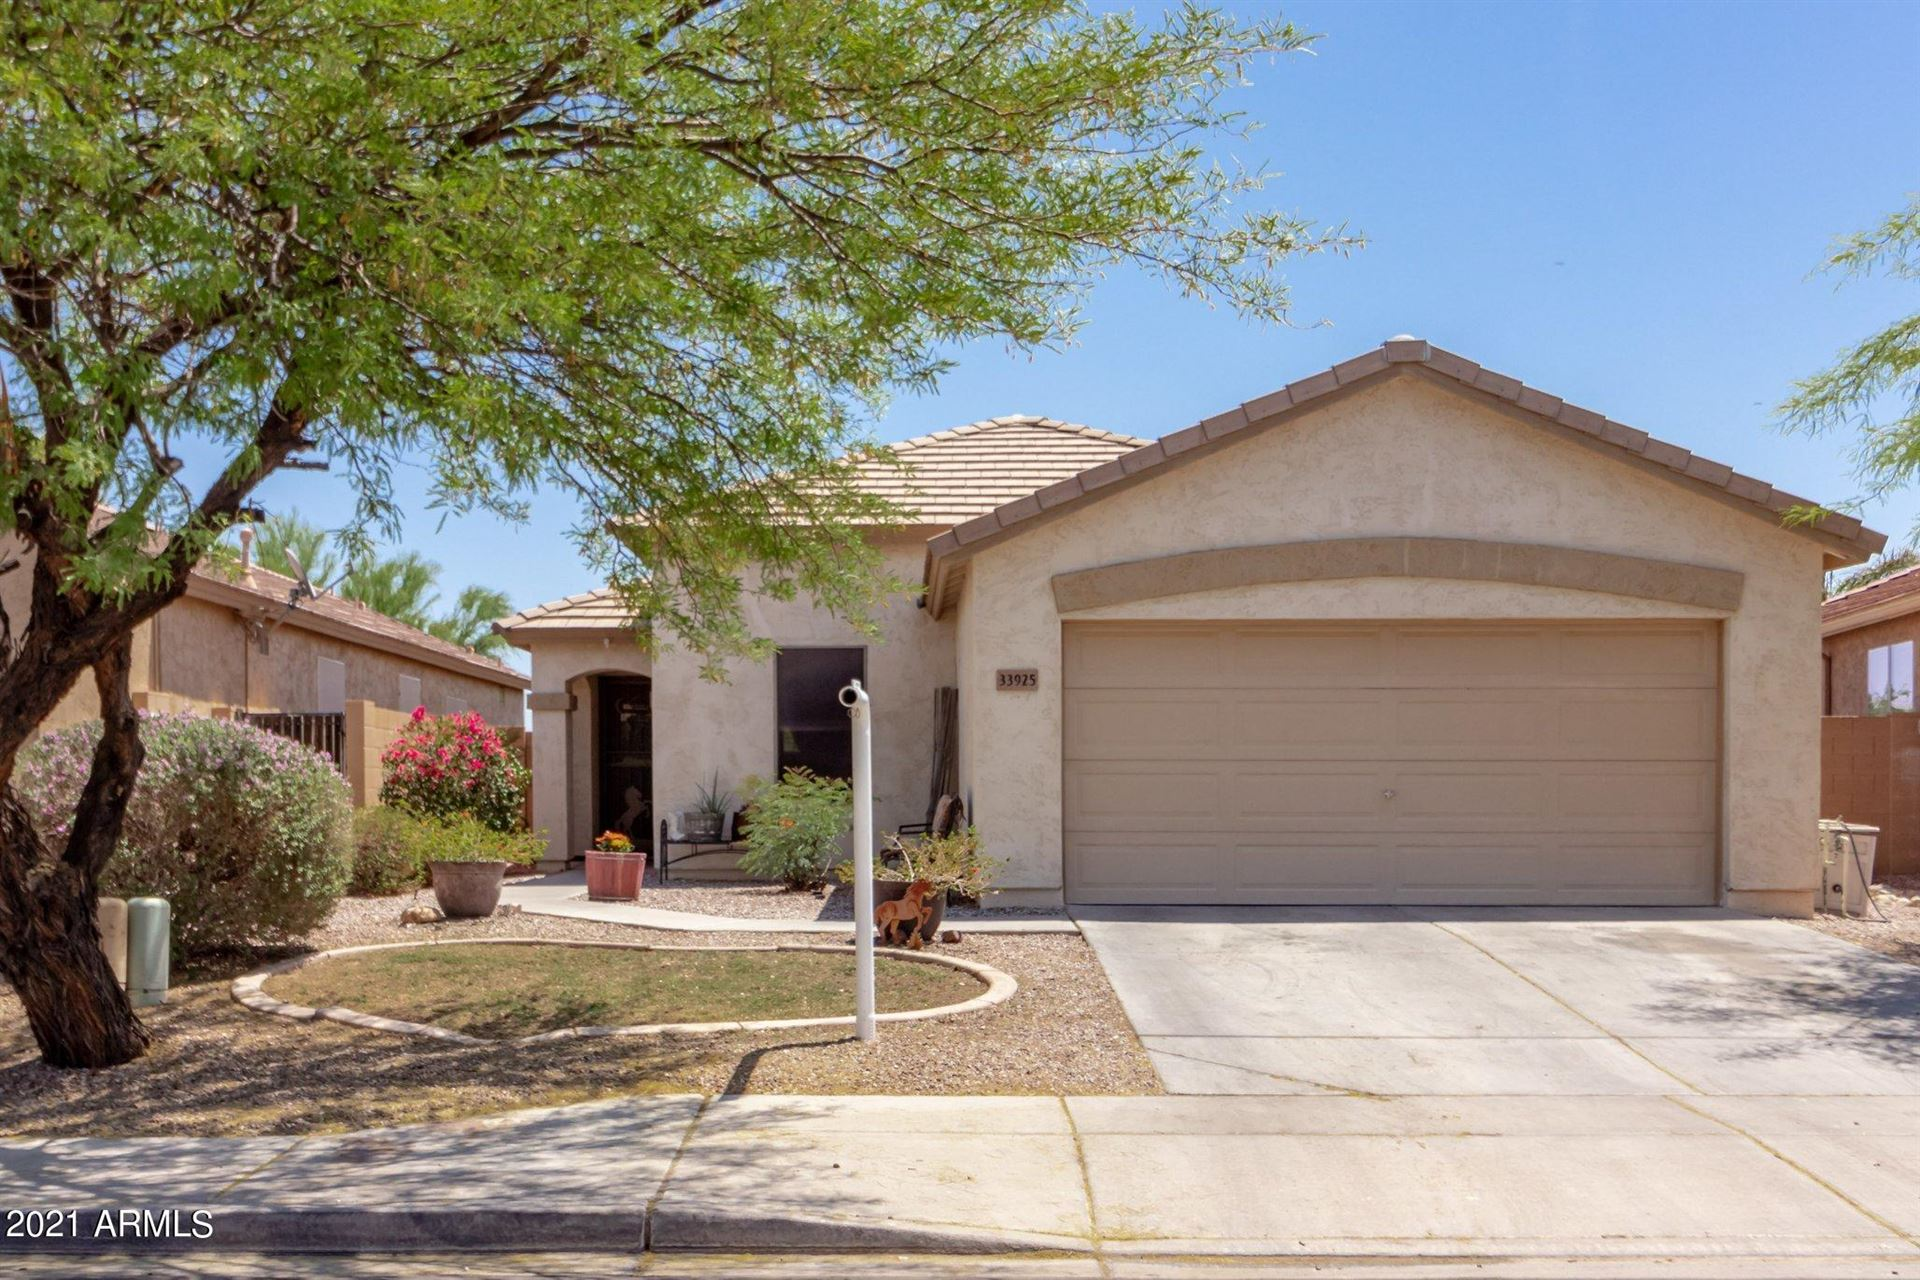 Photo of 33925 N WASH VIEW Road, Queen Creek, AZ 85142 (MLS # 6230233)